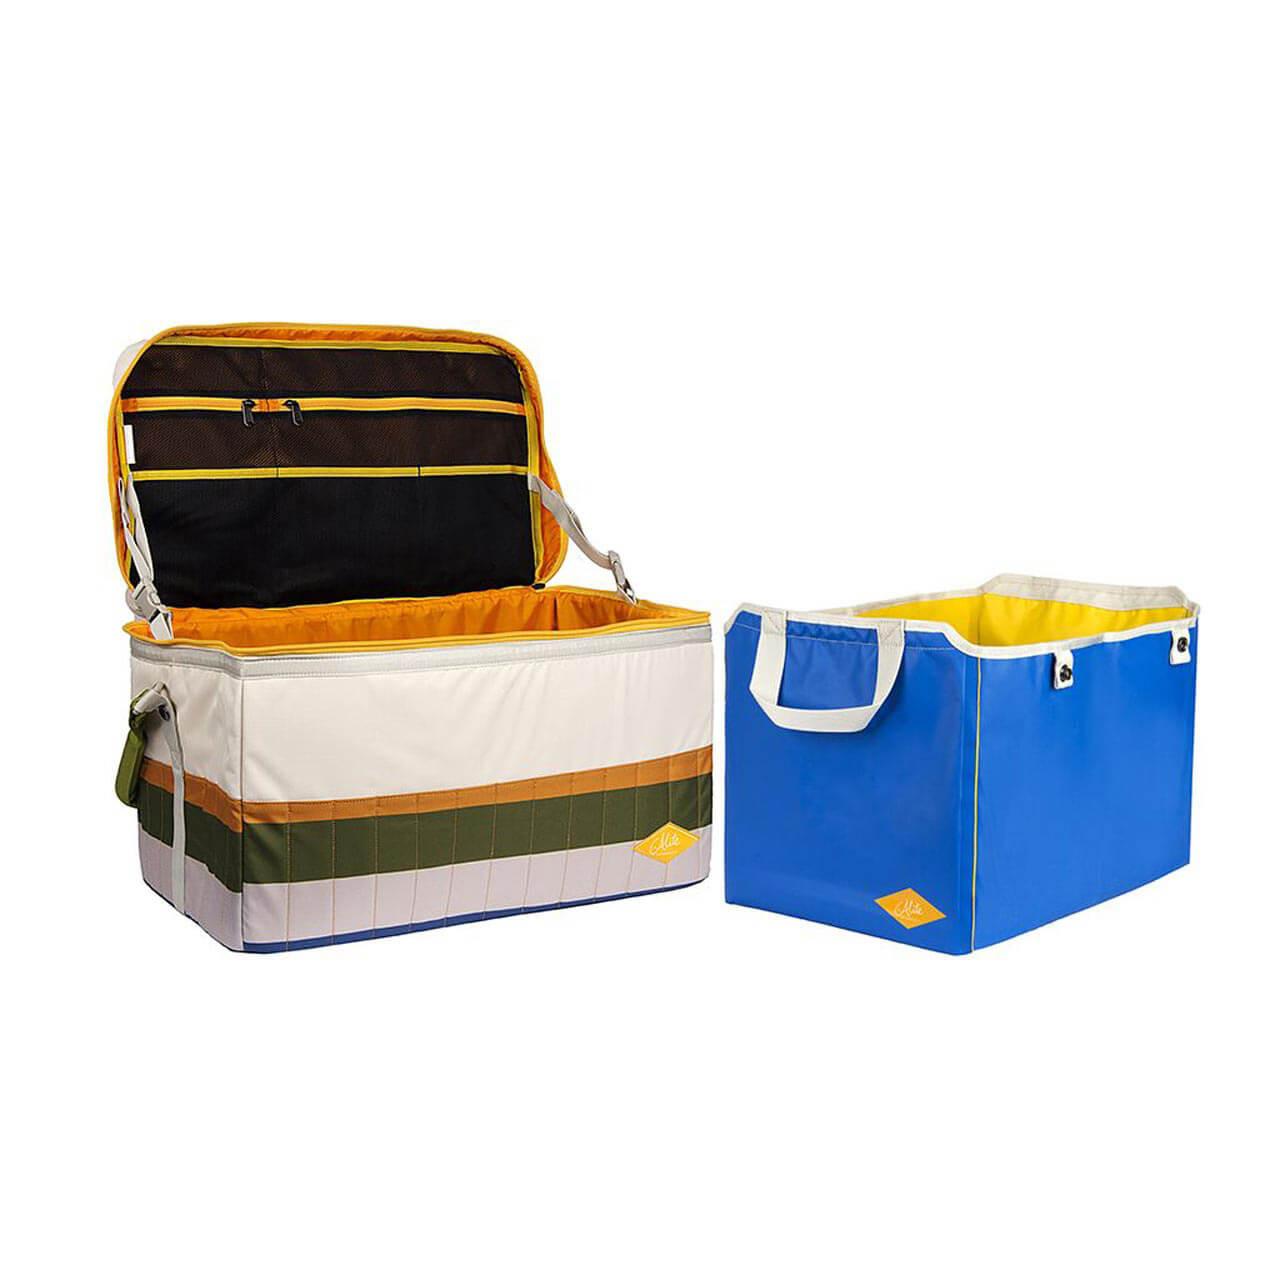 Alite Fiesta Cooler and removable waterproof liner